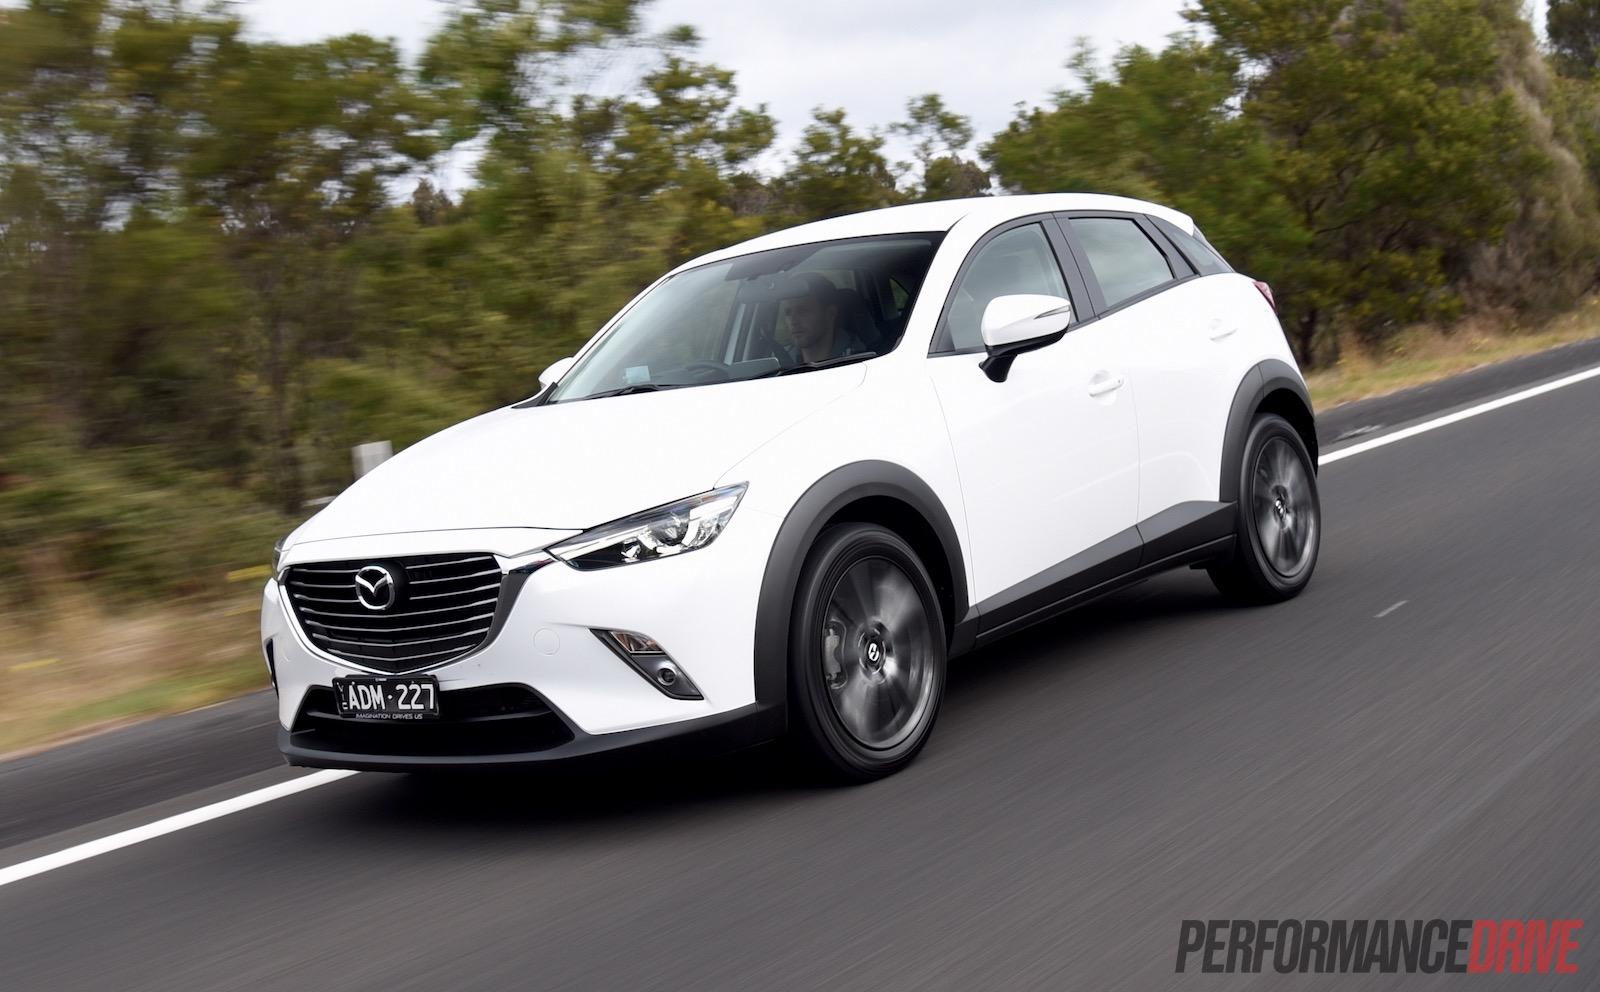 Kekurangan Mazda Cx 3 2015 Harga